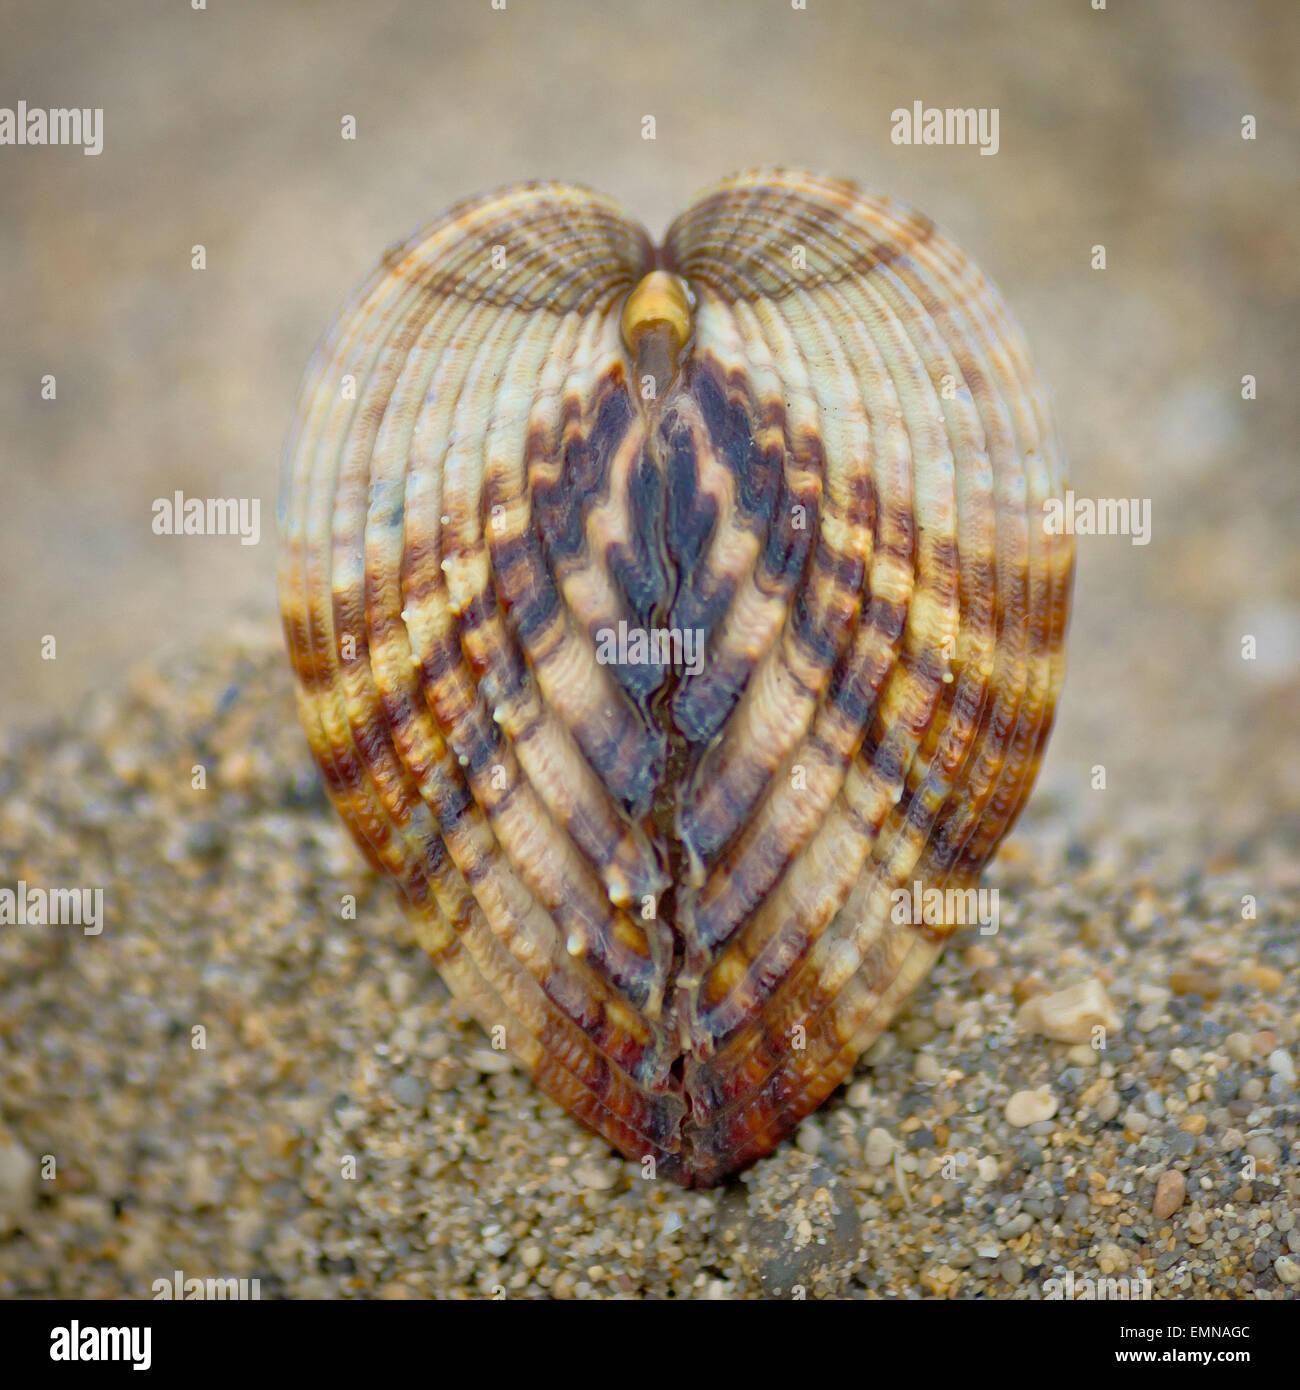 Symmetrie der Muschel am Strand - grobe Herzmuschel (Acanthocardia Tuberculata) Stockbild